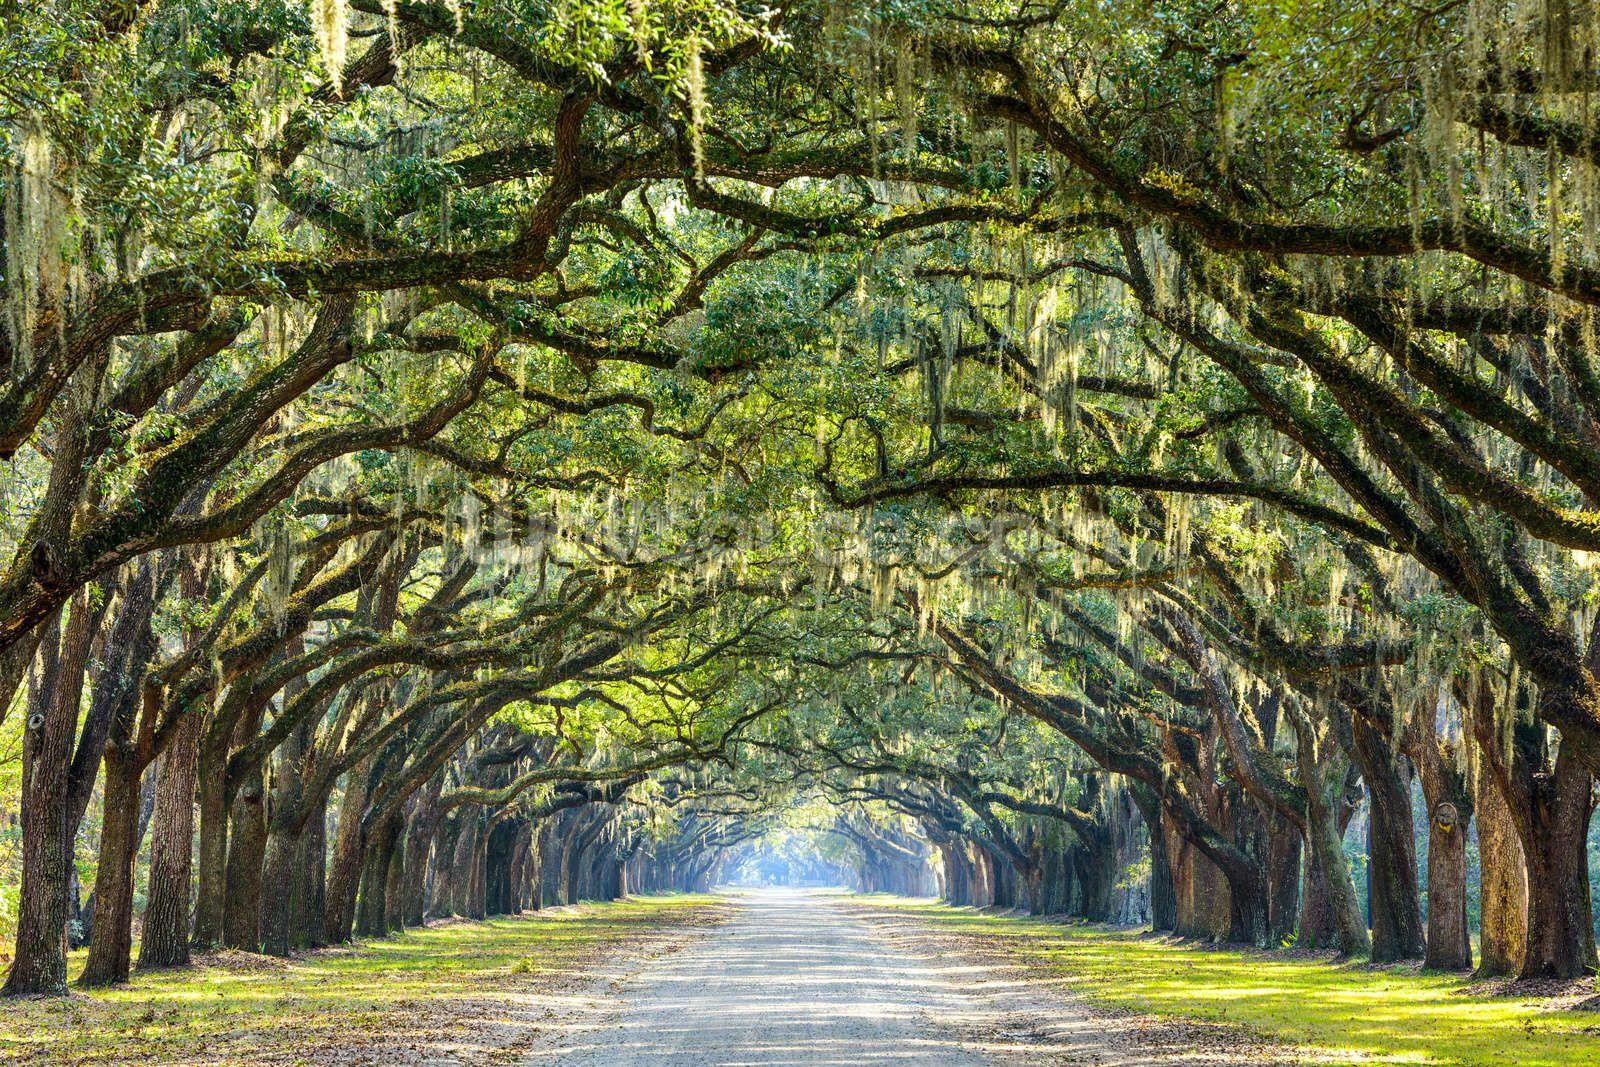 Oak Tree Road Savannah, Savannah chat, Old trees